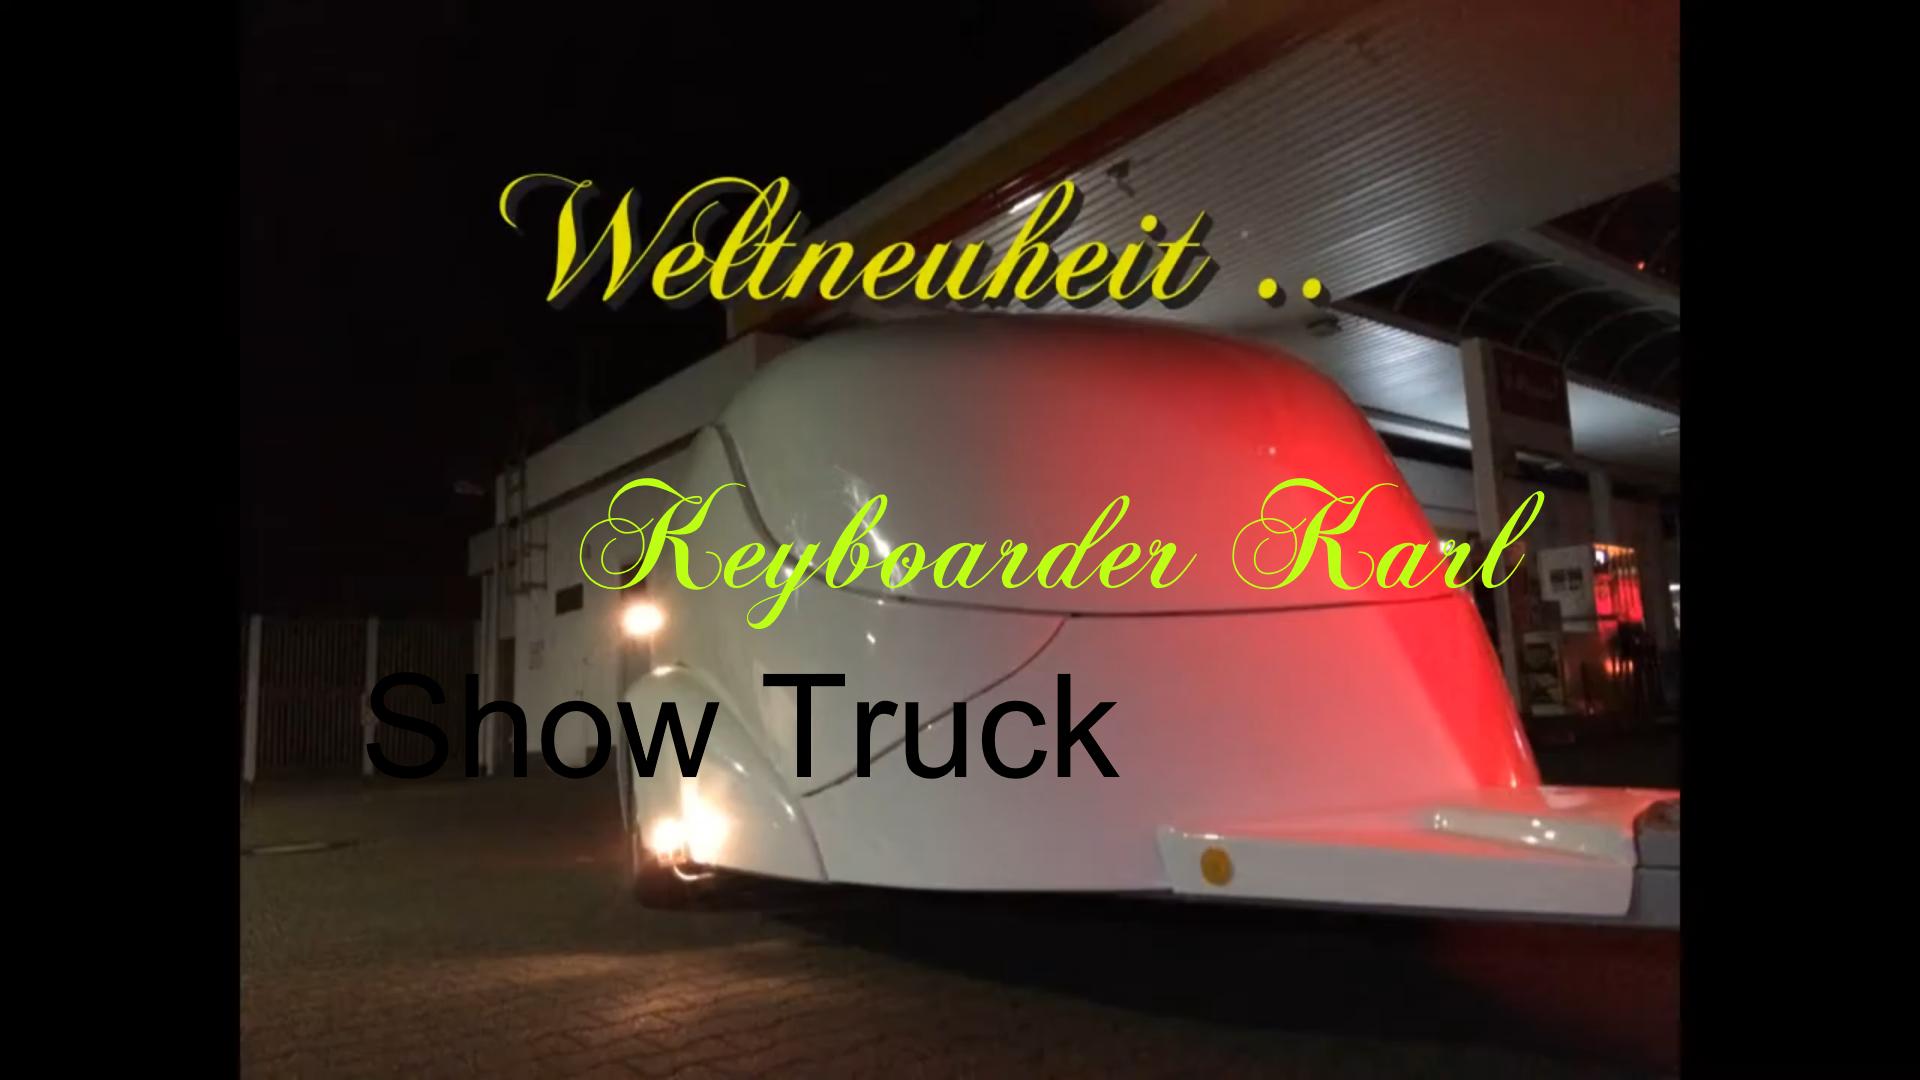 Keyboarder Karl Show Truck